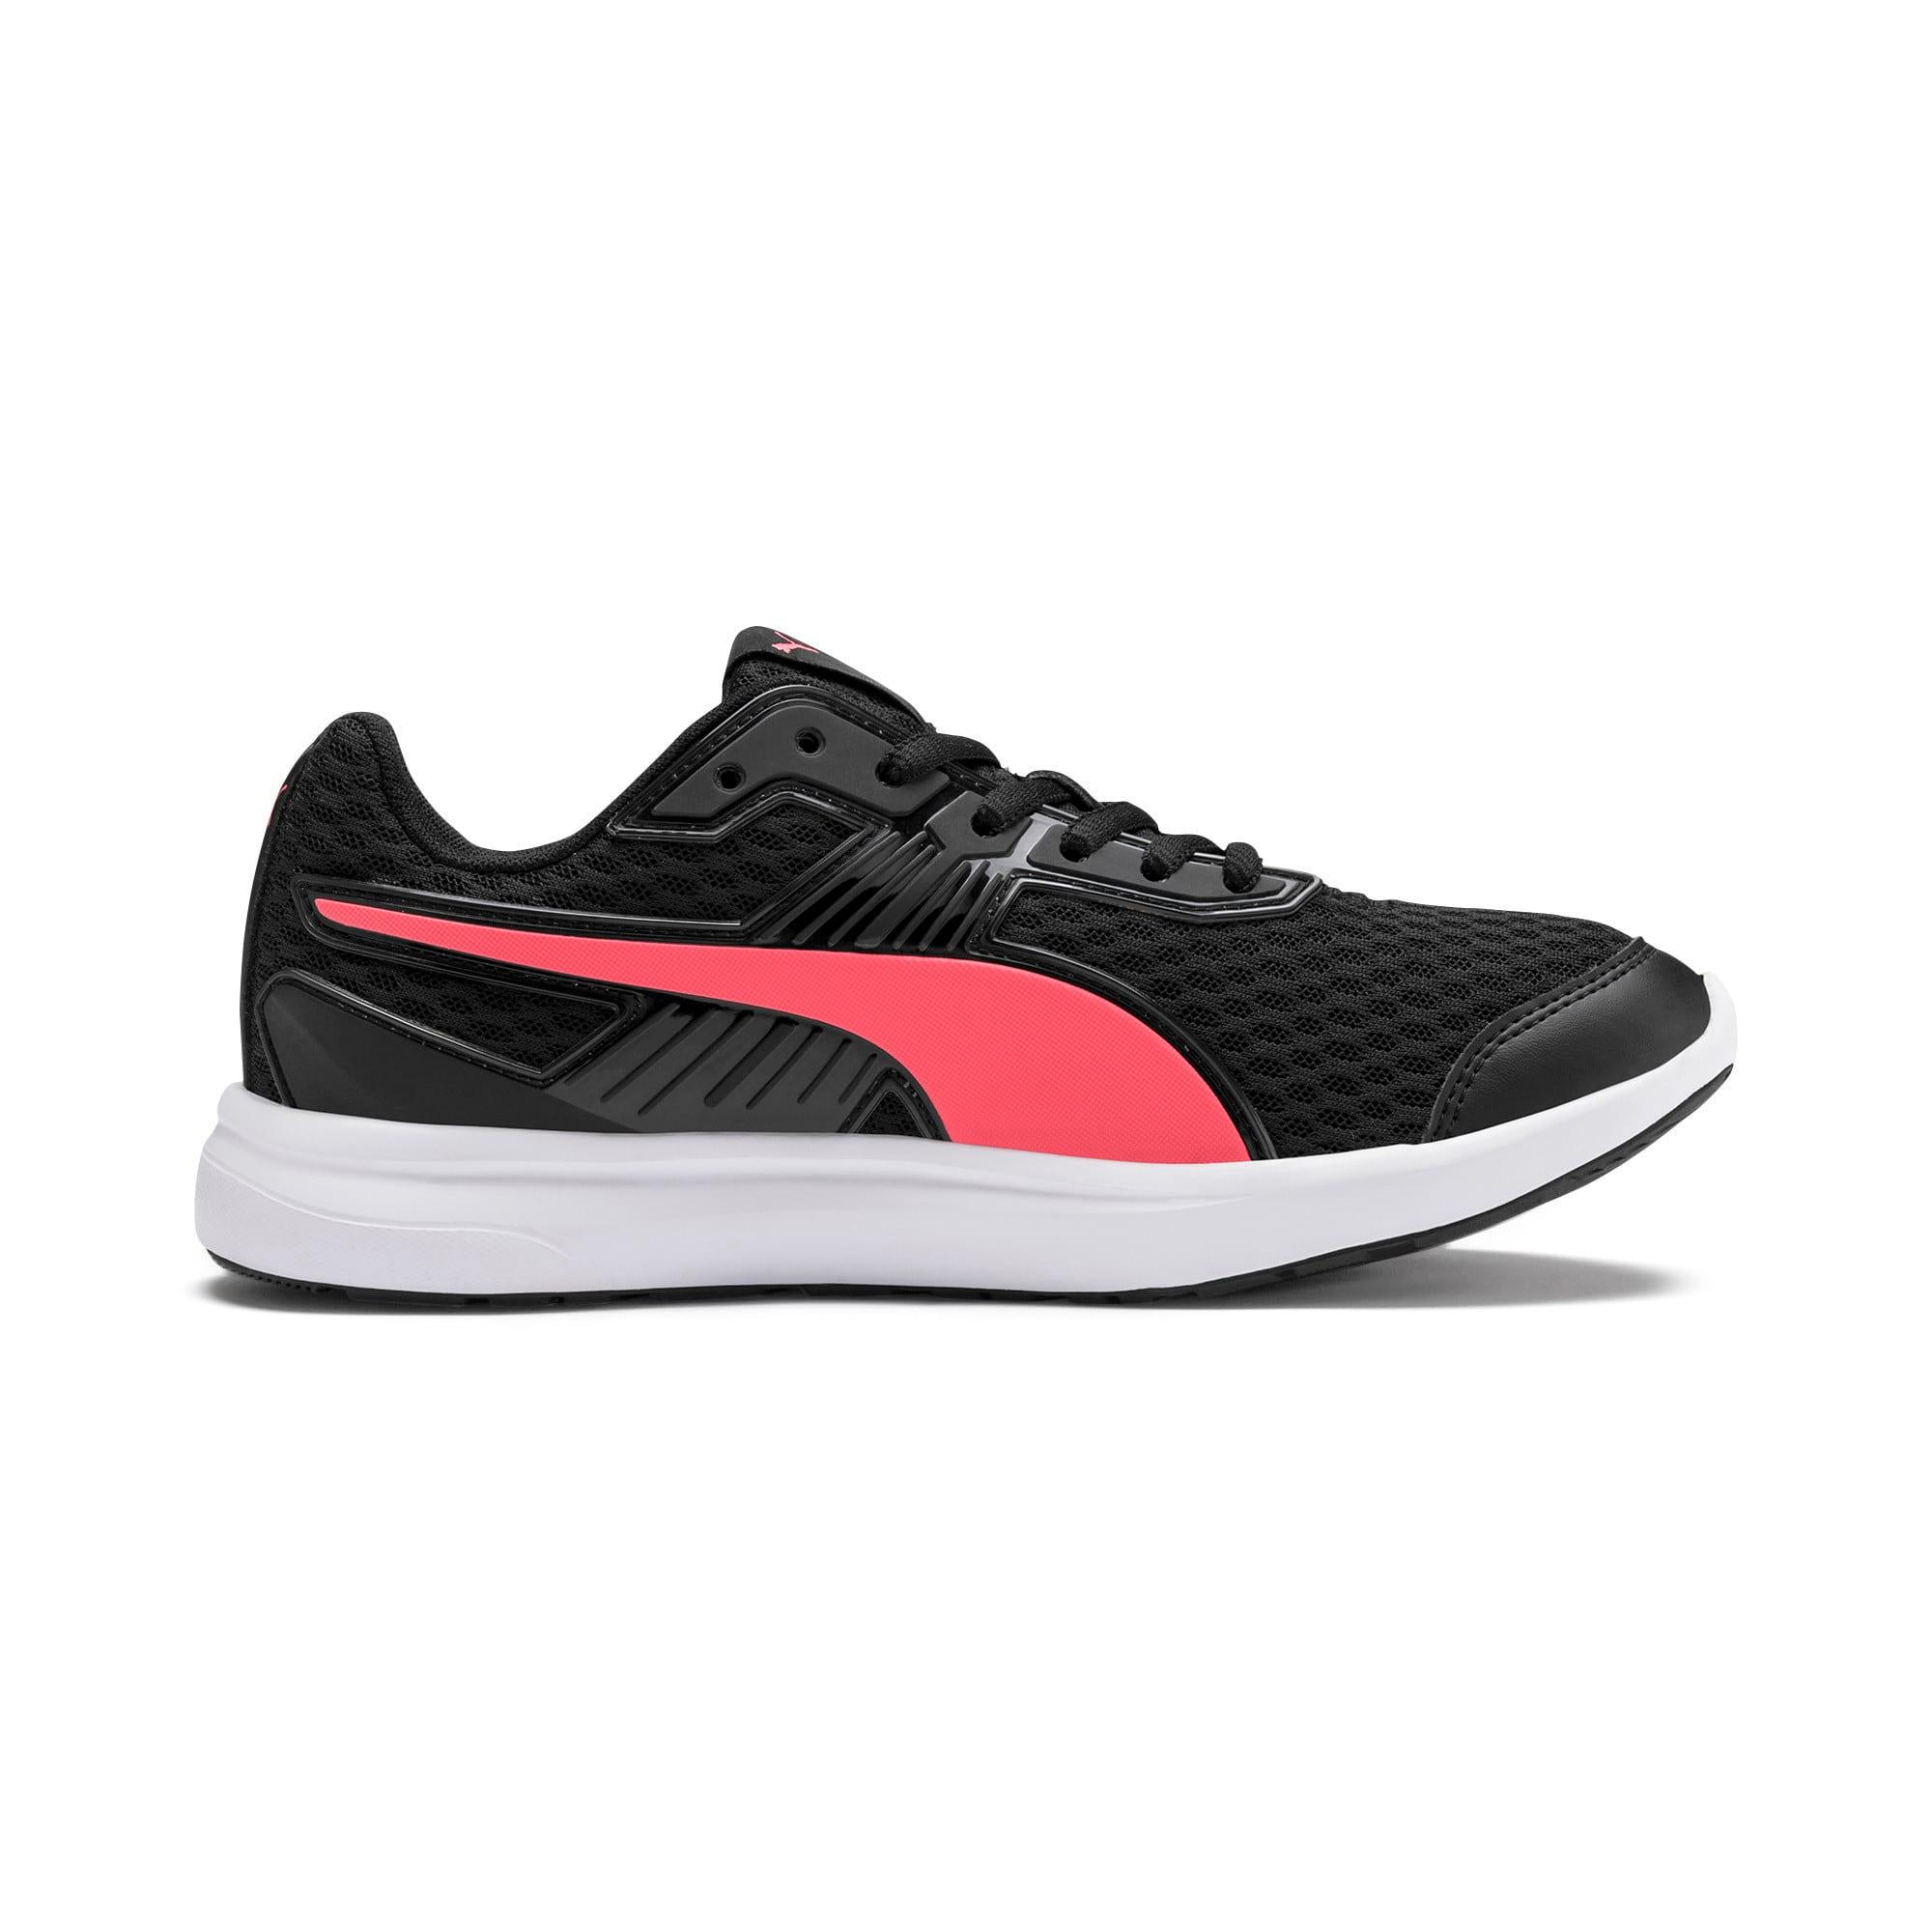 Thumbnail 5 of Escaper Pro Training Shoes, Black-Calypso Coral-White, medium-IND